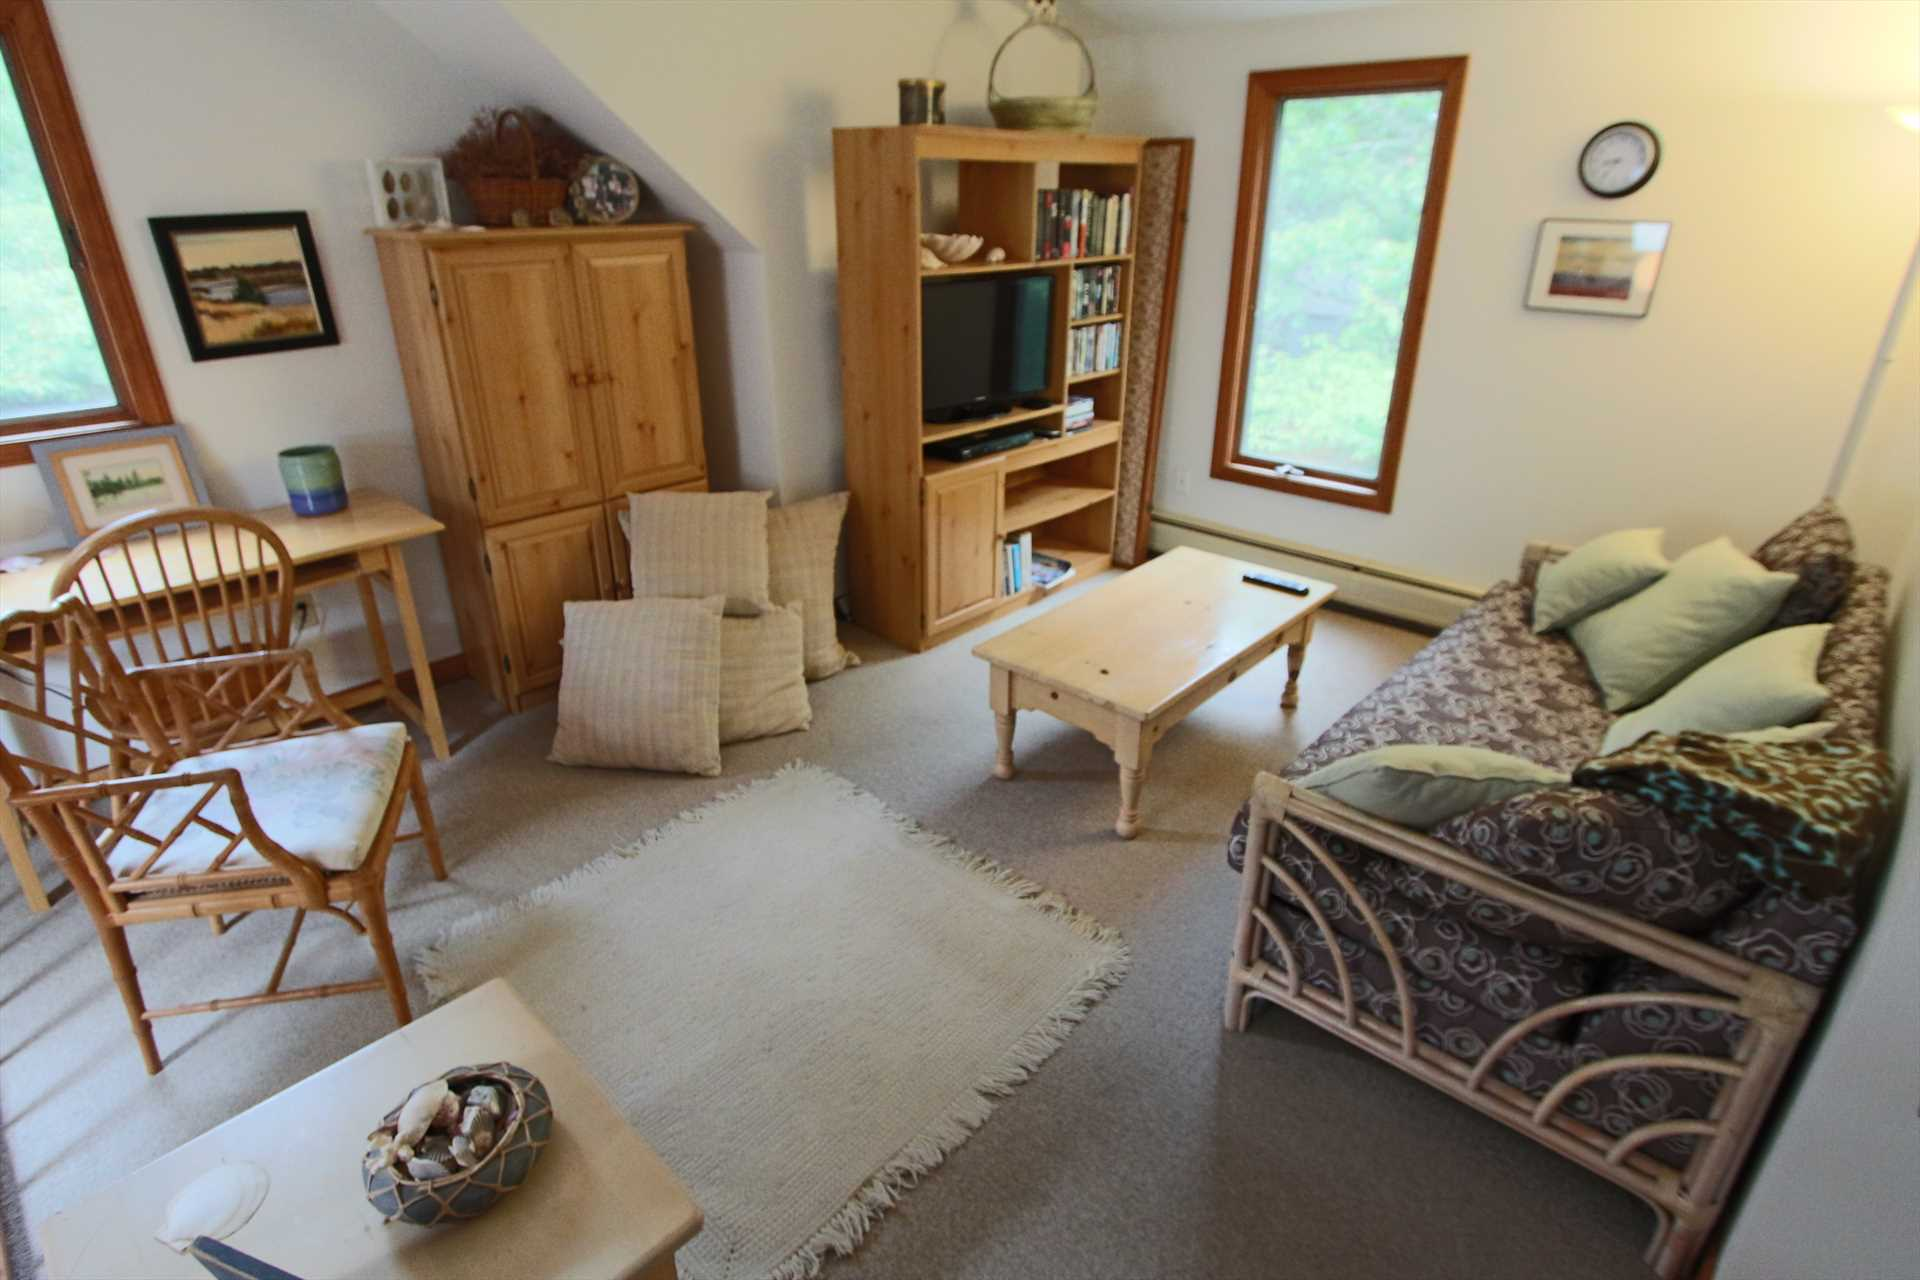 Sitting area upstairs